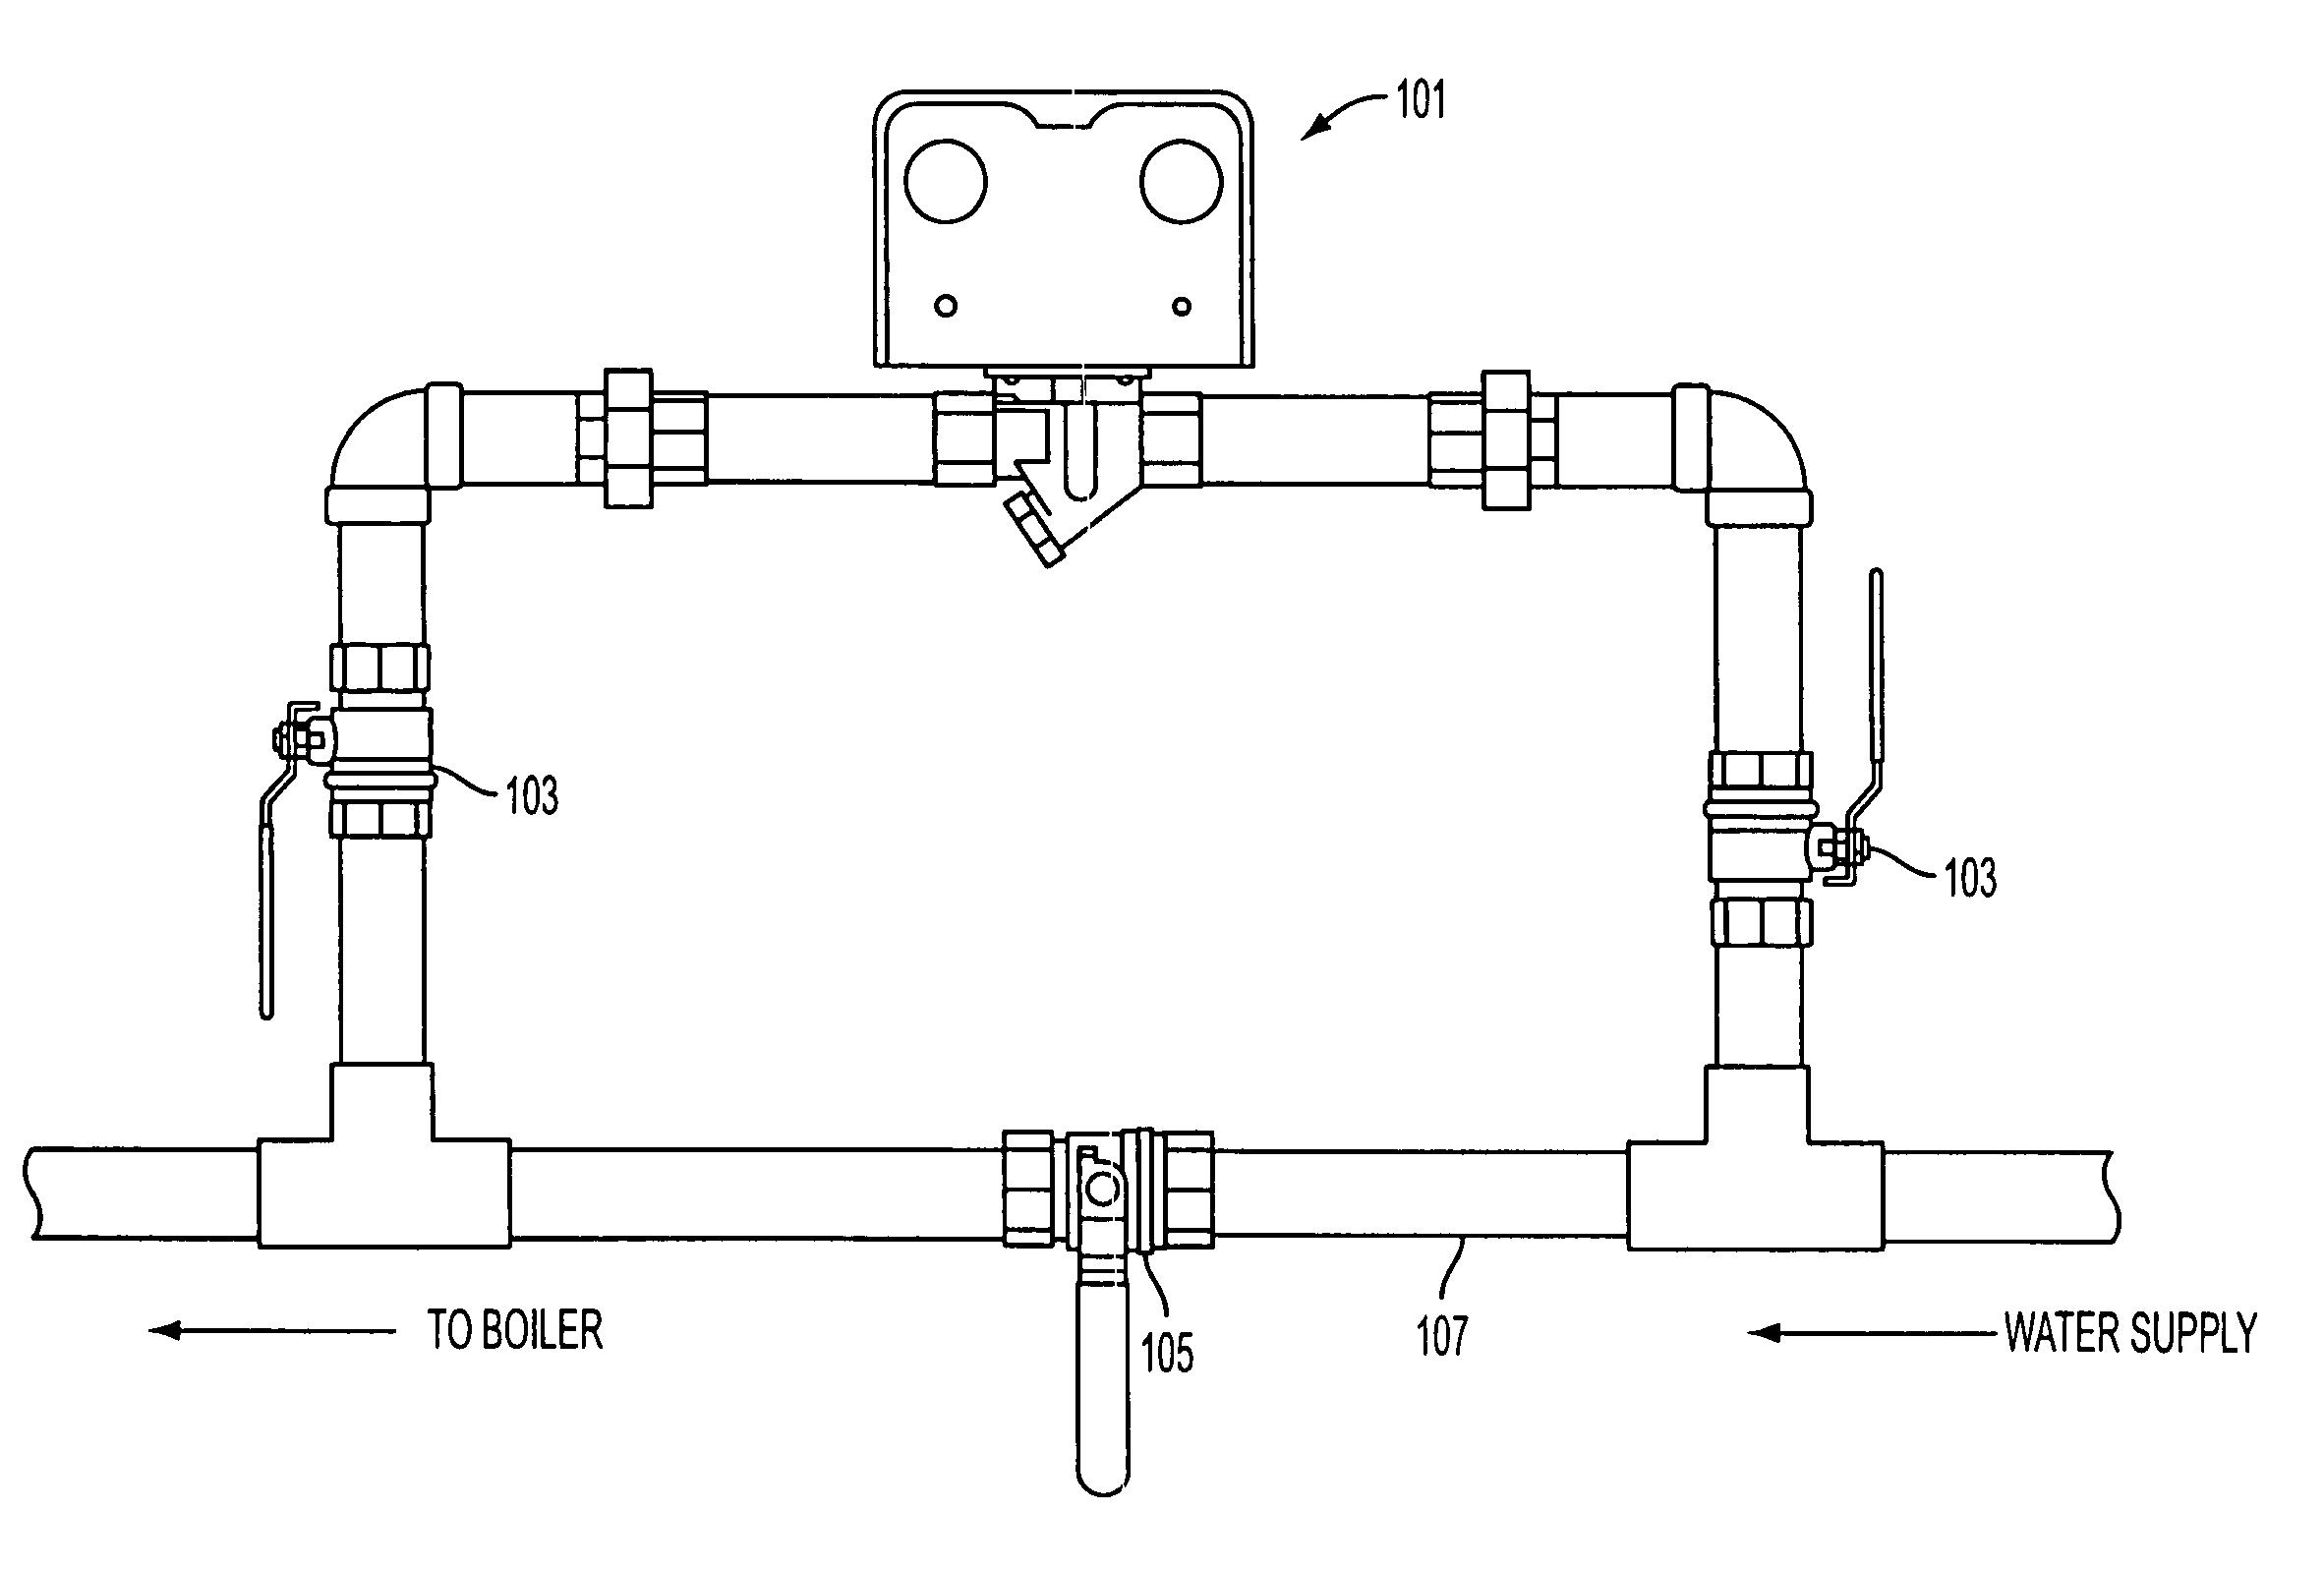 Zone Control Wiring Diagram Moreover Taco Zone Valve Wiring Diagram